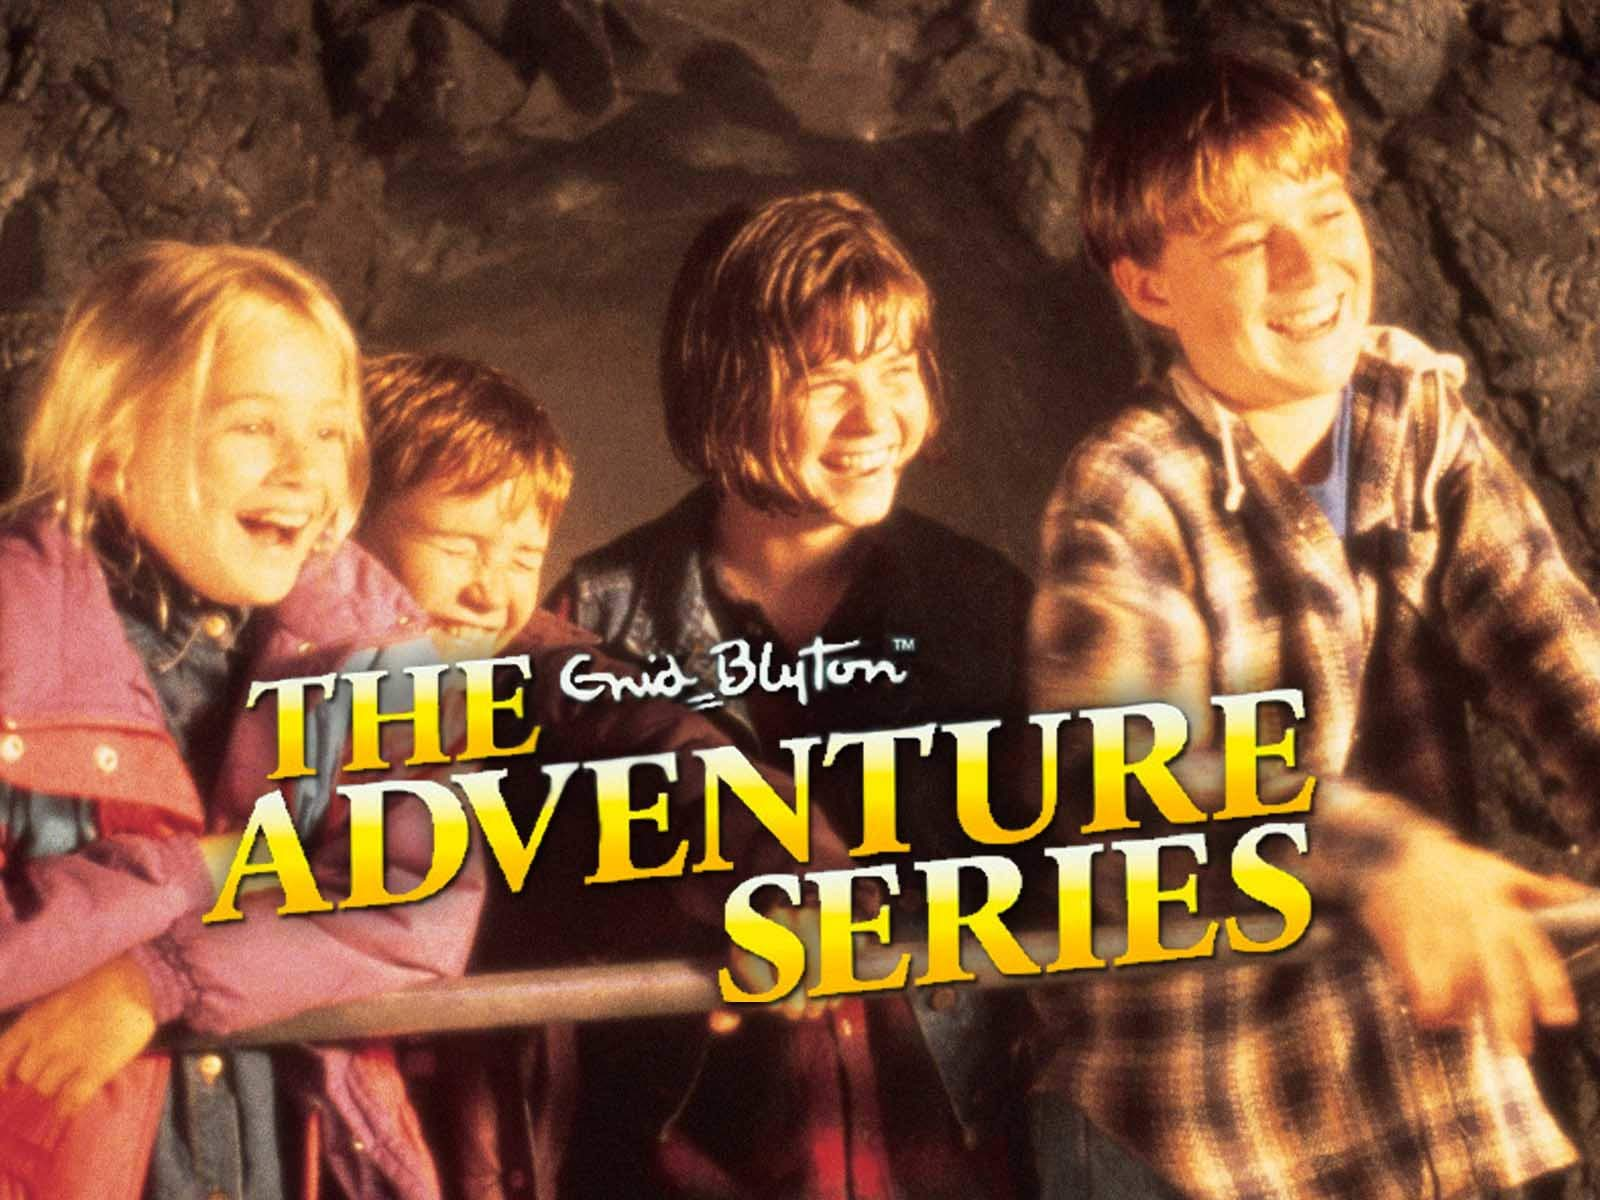 Amazon com: Watch The Enid Blyton Adventure Series | Prime Video